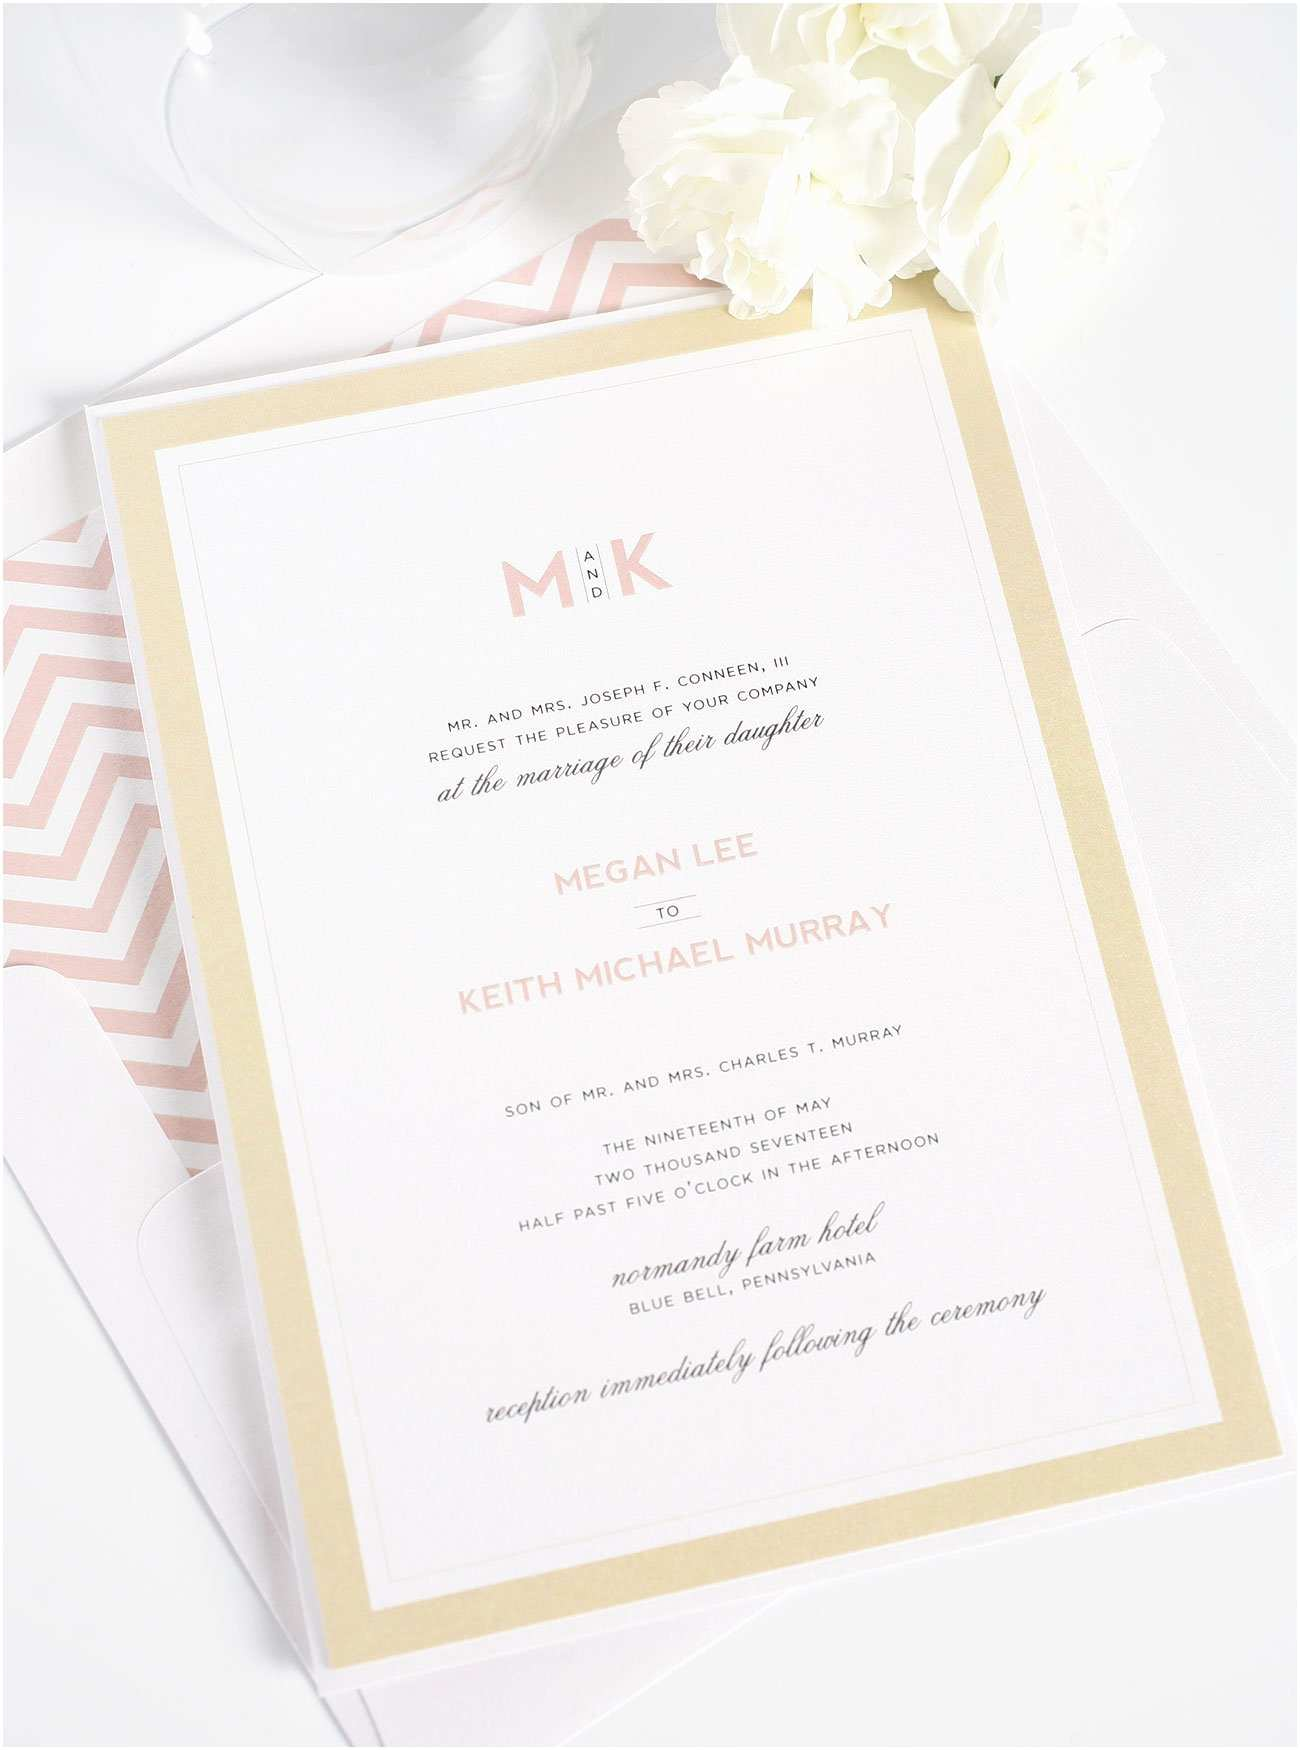 Blush Wedding Invitations Modern Wedding Invitations In Blush and Gold – Wedding